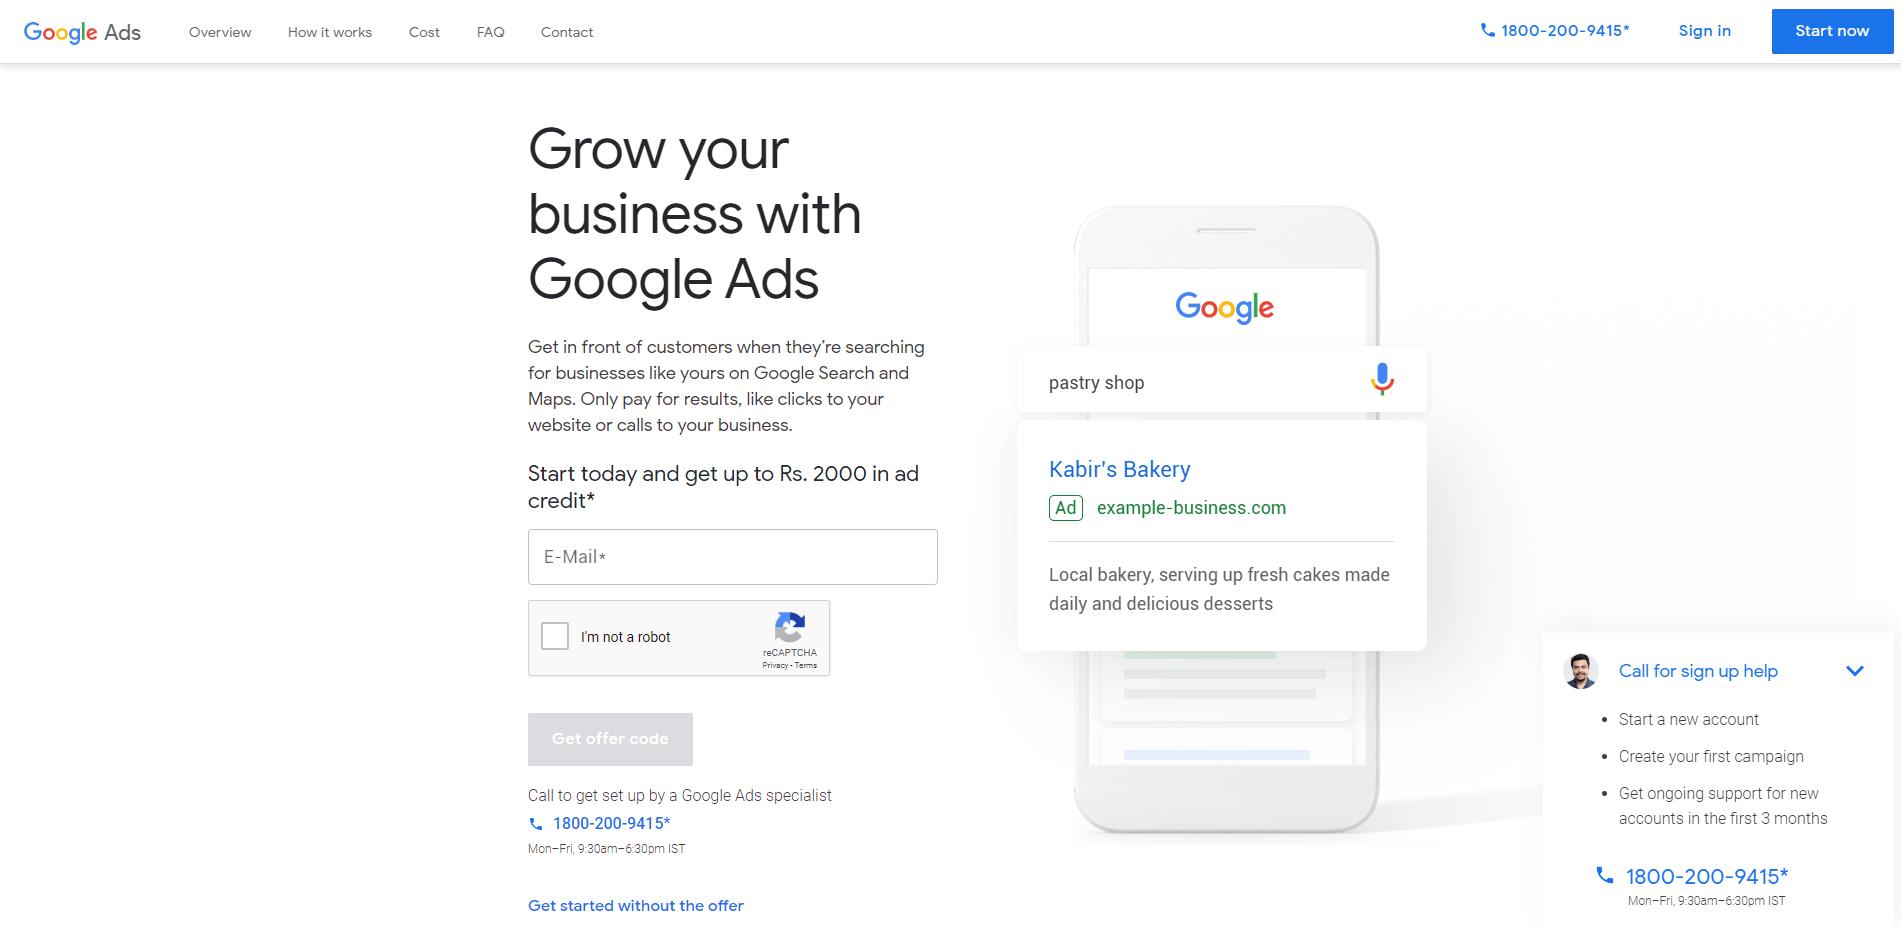 1. Google Adwords